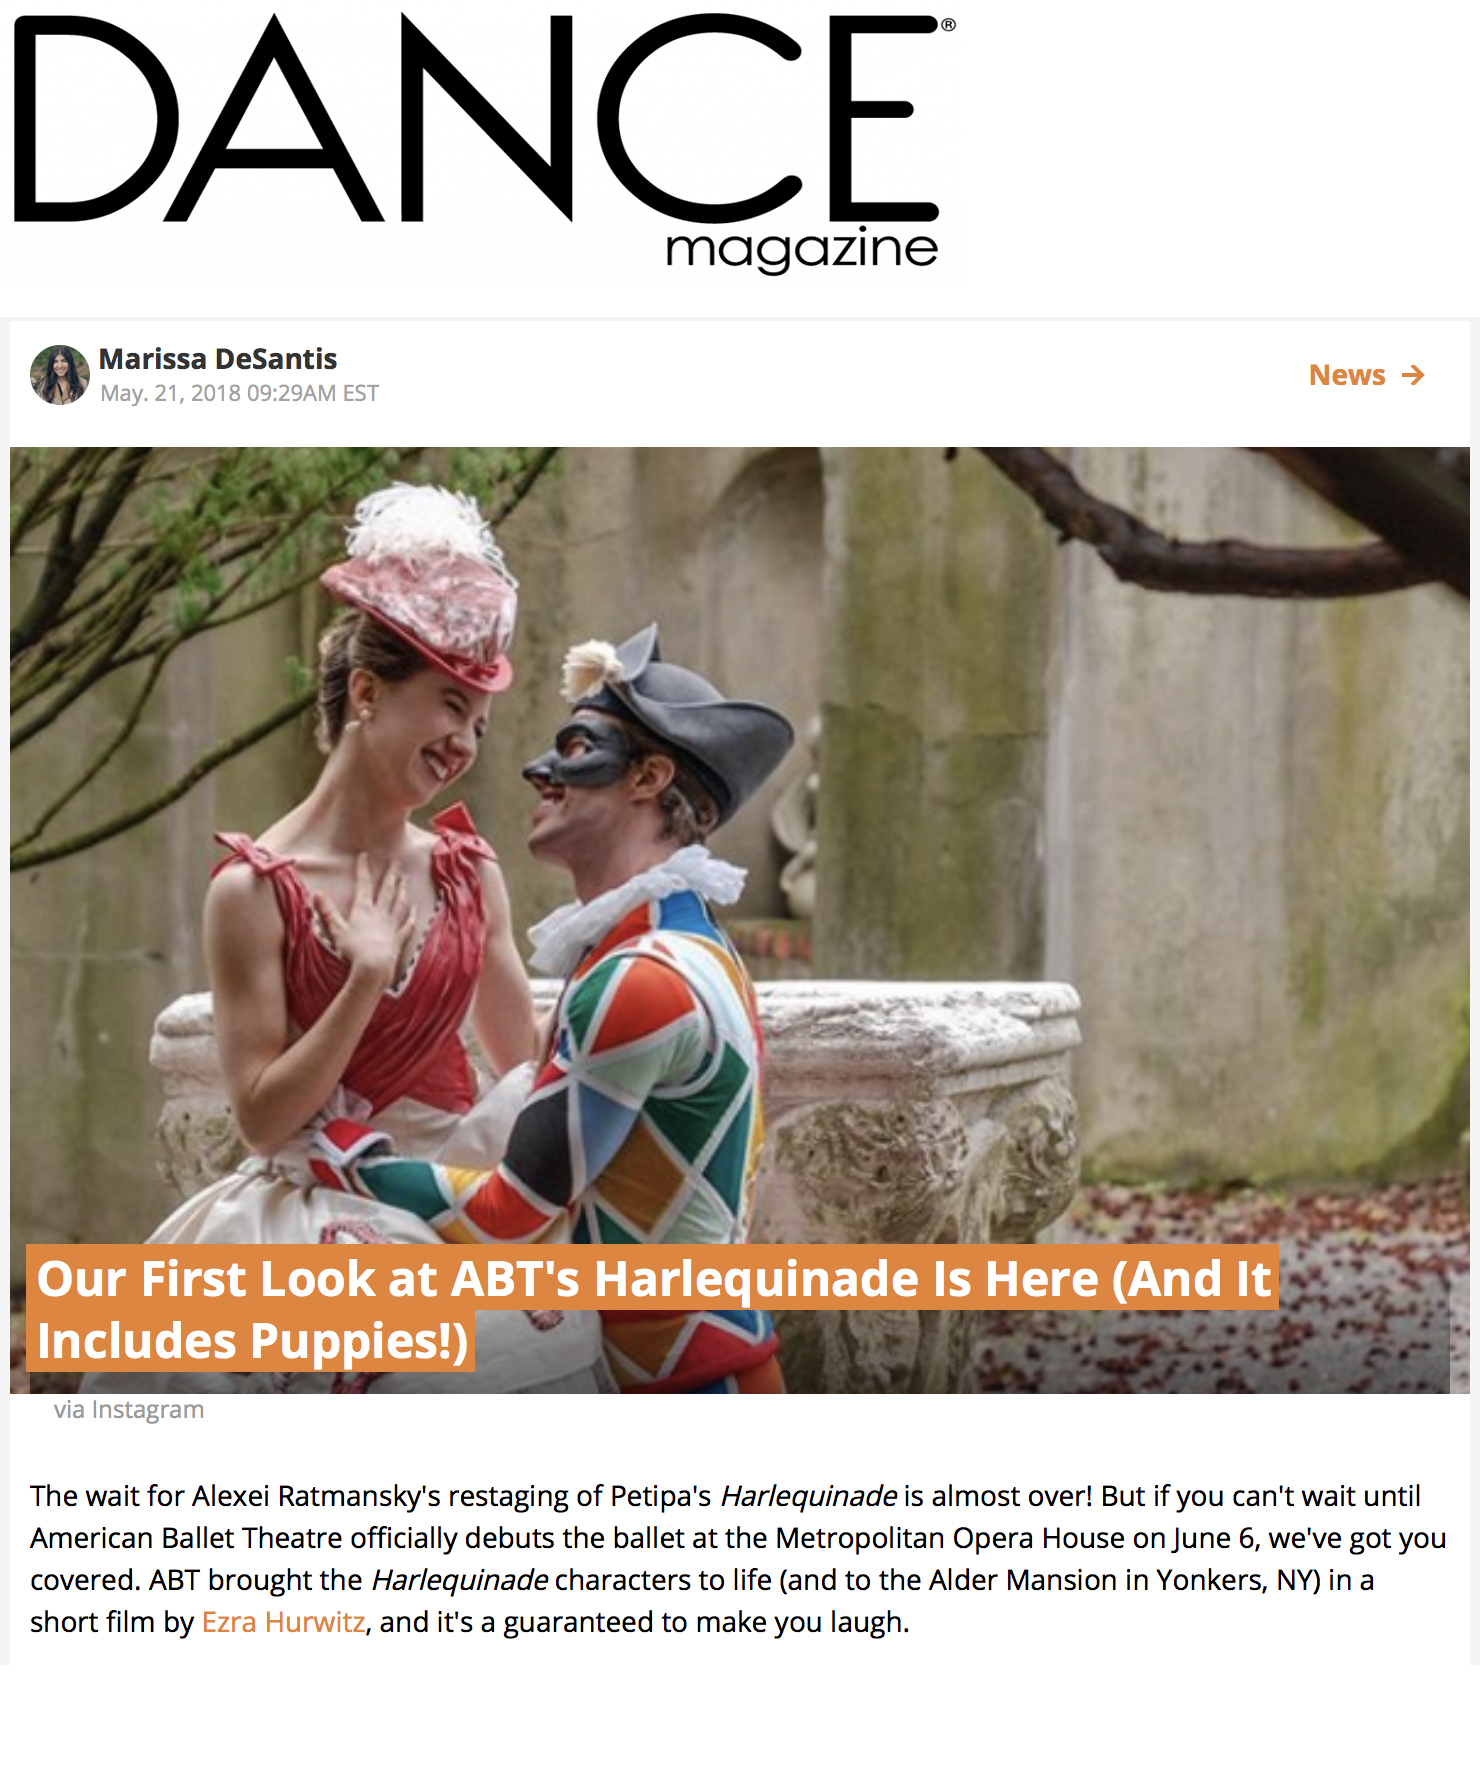 dancemagazine4.jpg